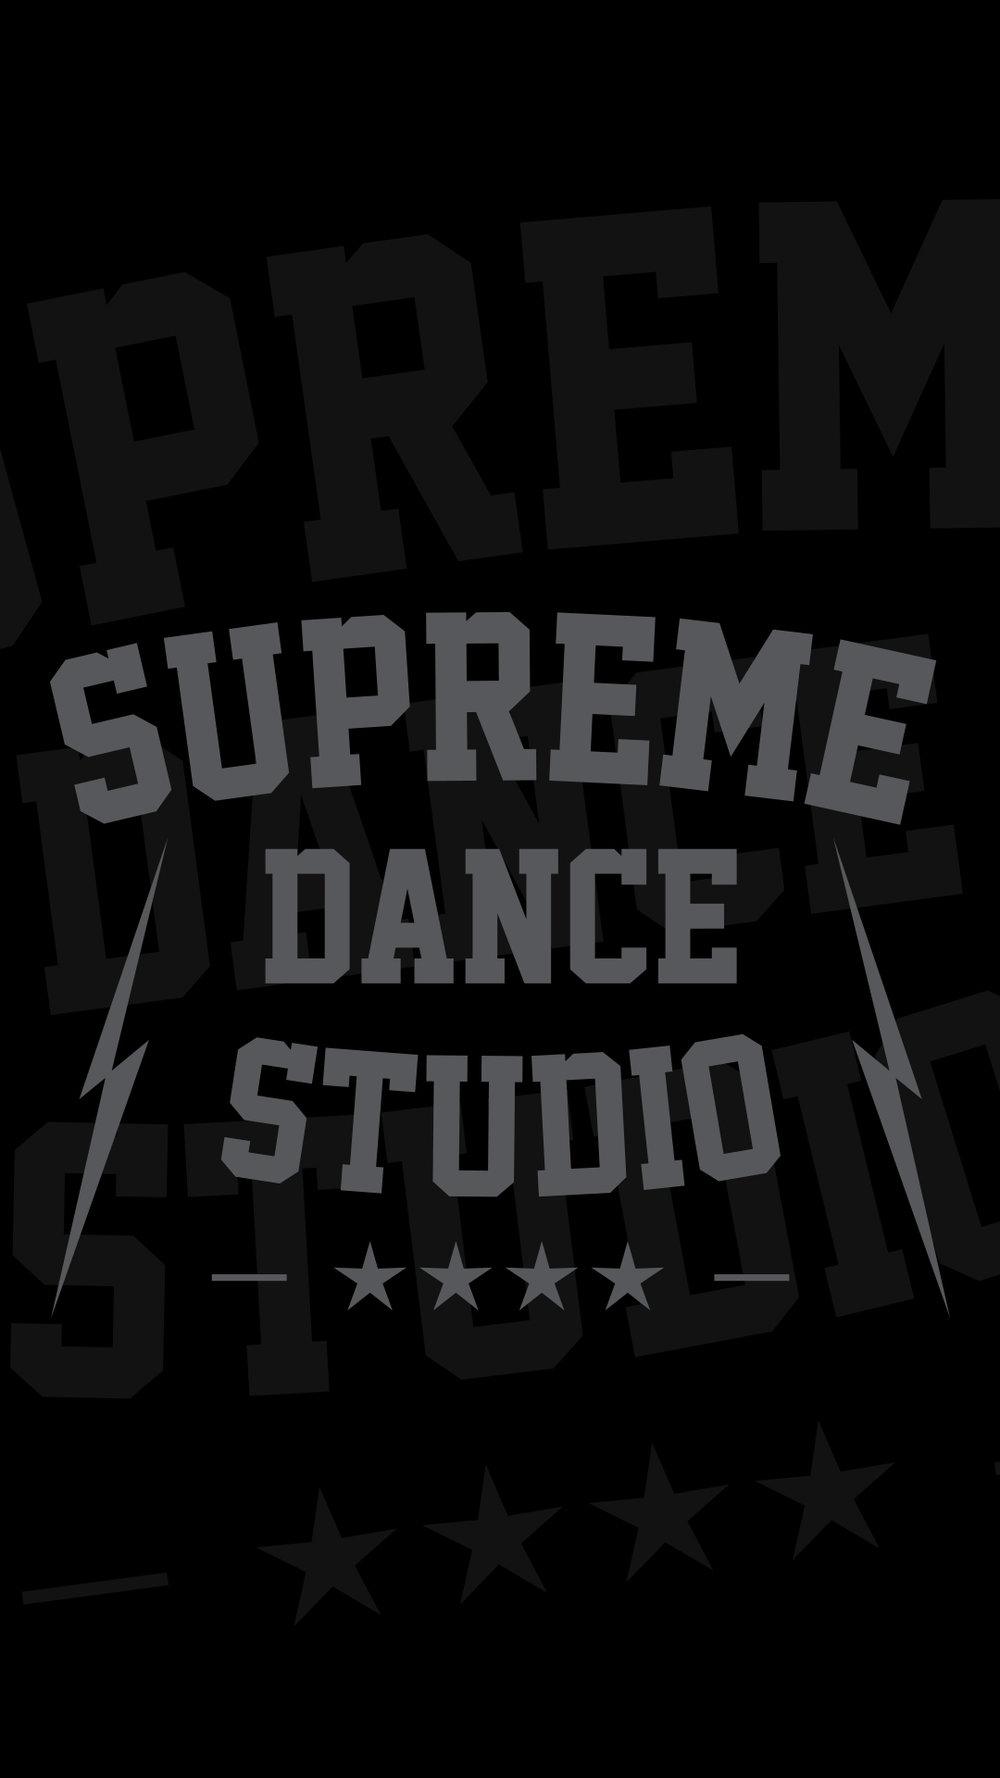 SupremeBG9.jpg